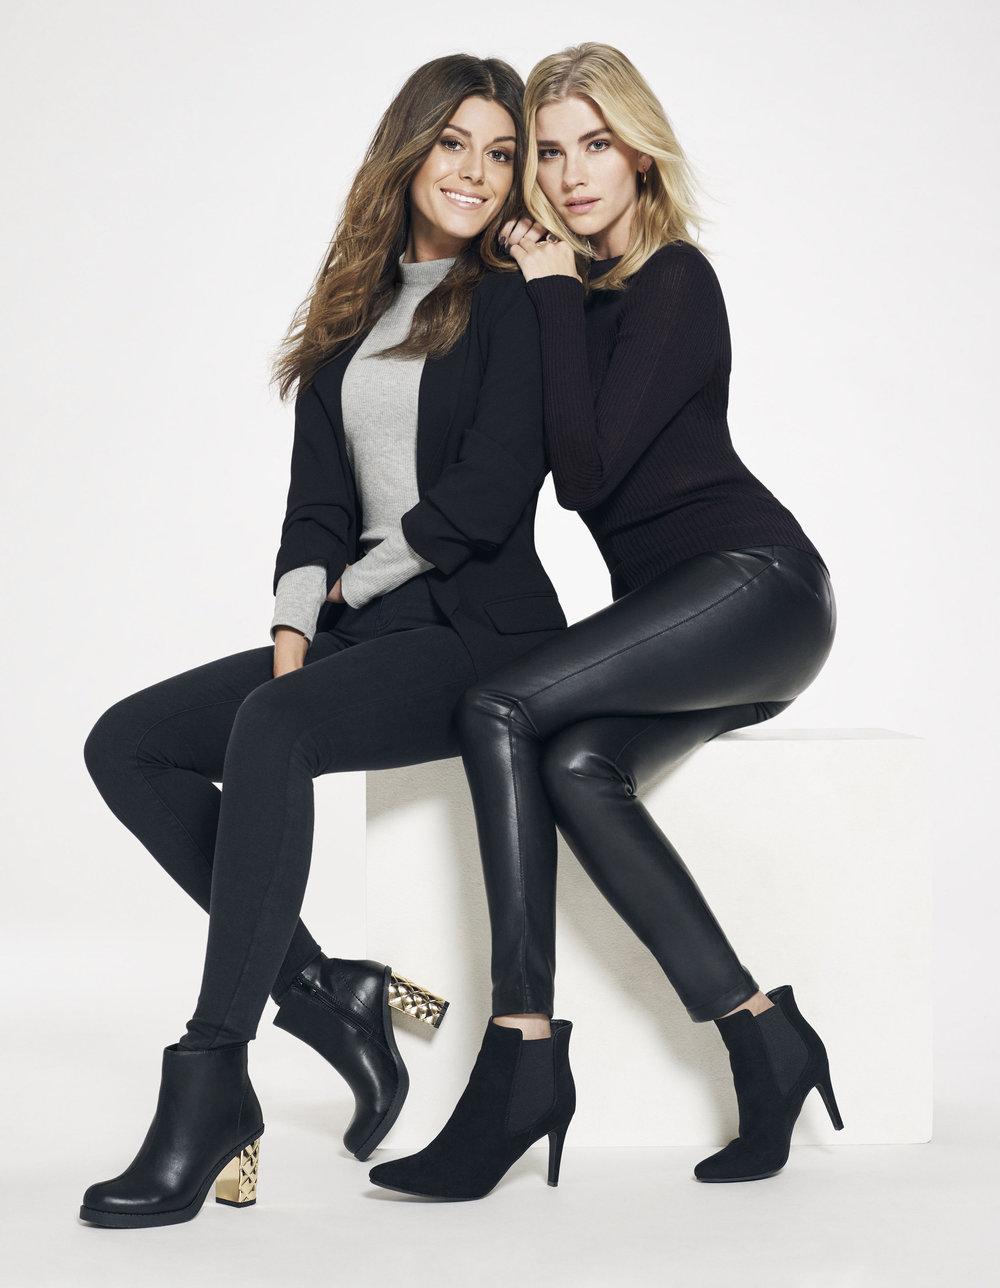 Feetfirst Fall 2016 with Bianca Ingrosso & Elsa Ekman